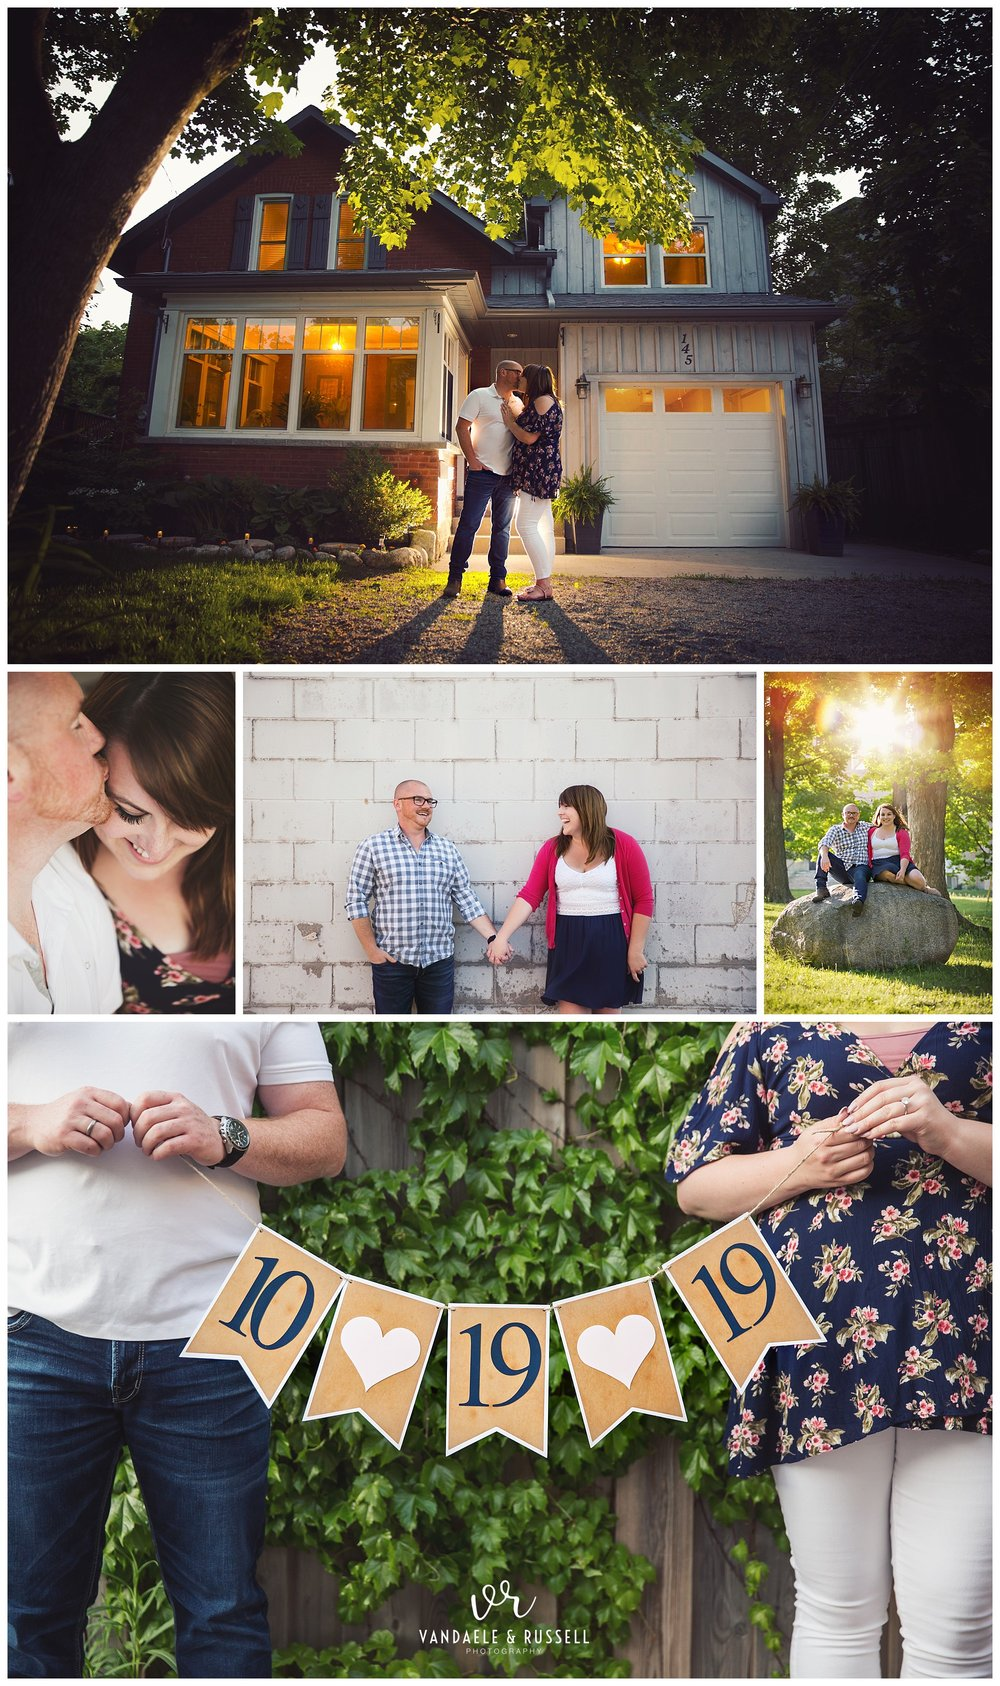 Fergus, Ontario engagement photos by VanDaele & Russell